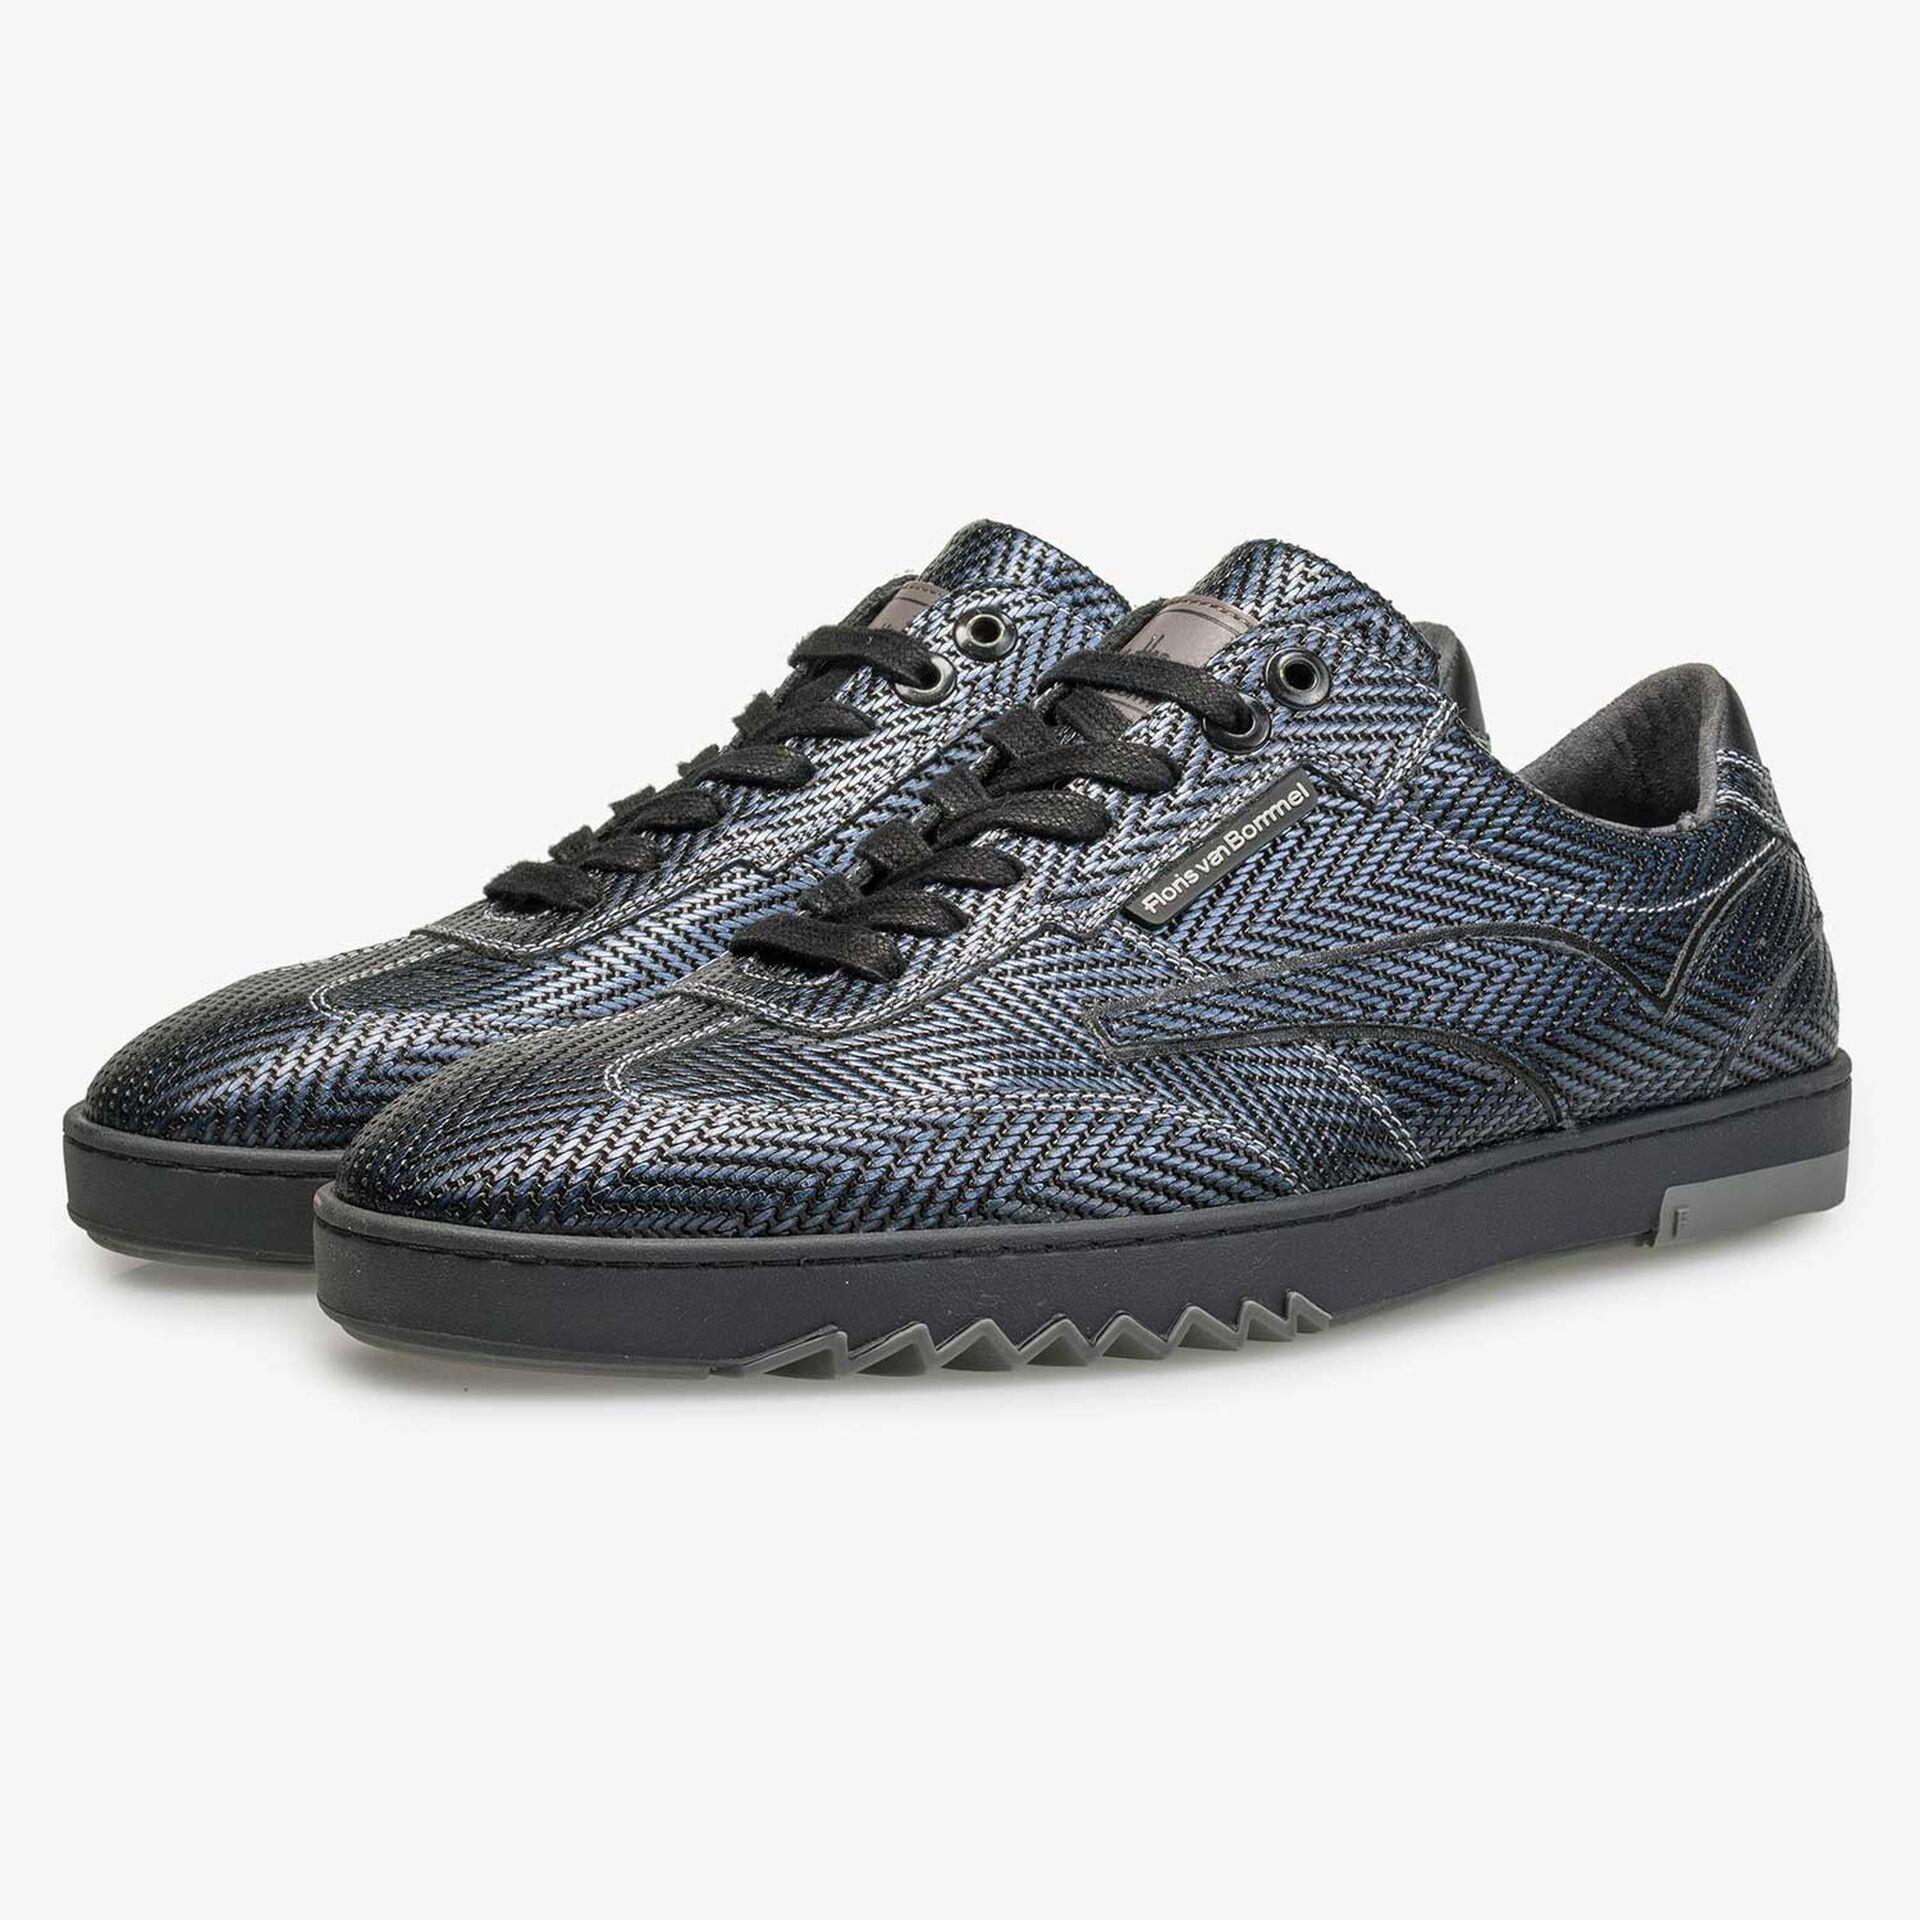 Premium blauwe sneaker met visgraatdessin